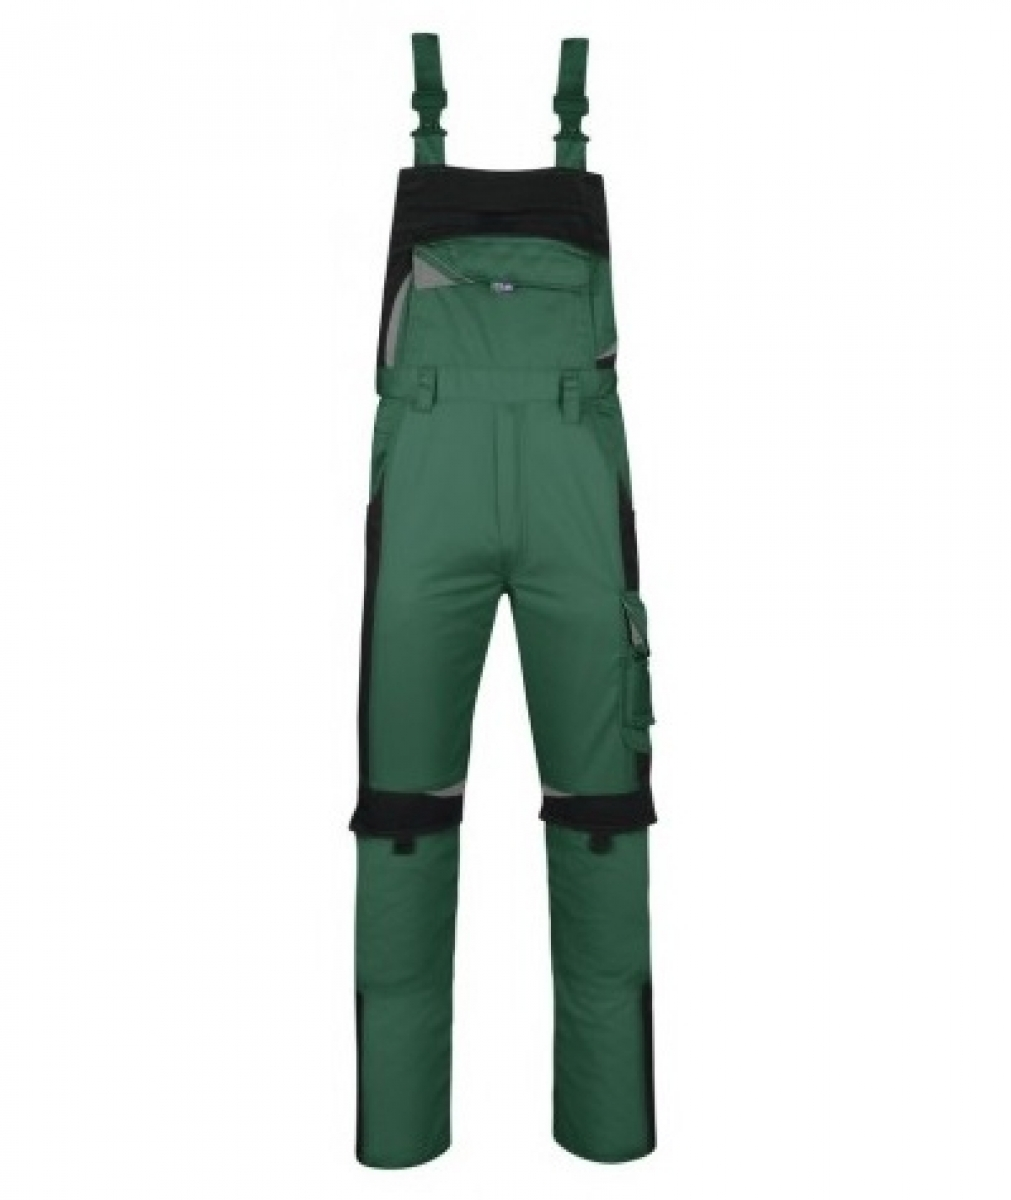 PKA Arbeits-Berufs-Latz-Hose Bestwork, MG300, grün/schwarz